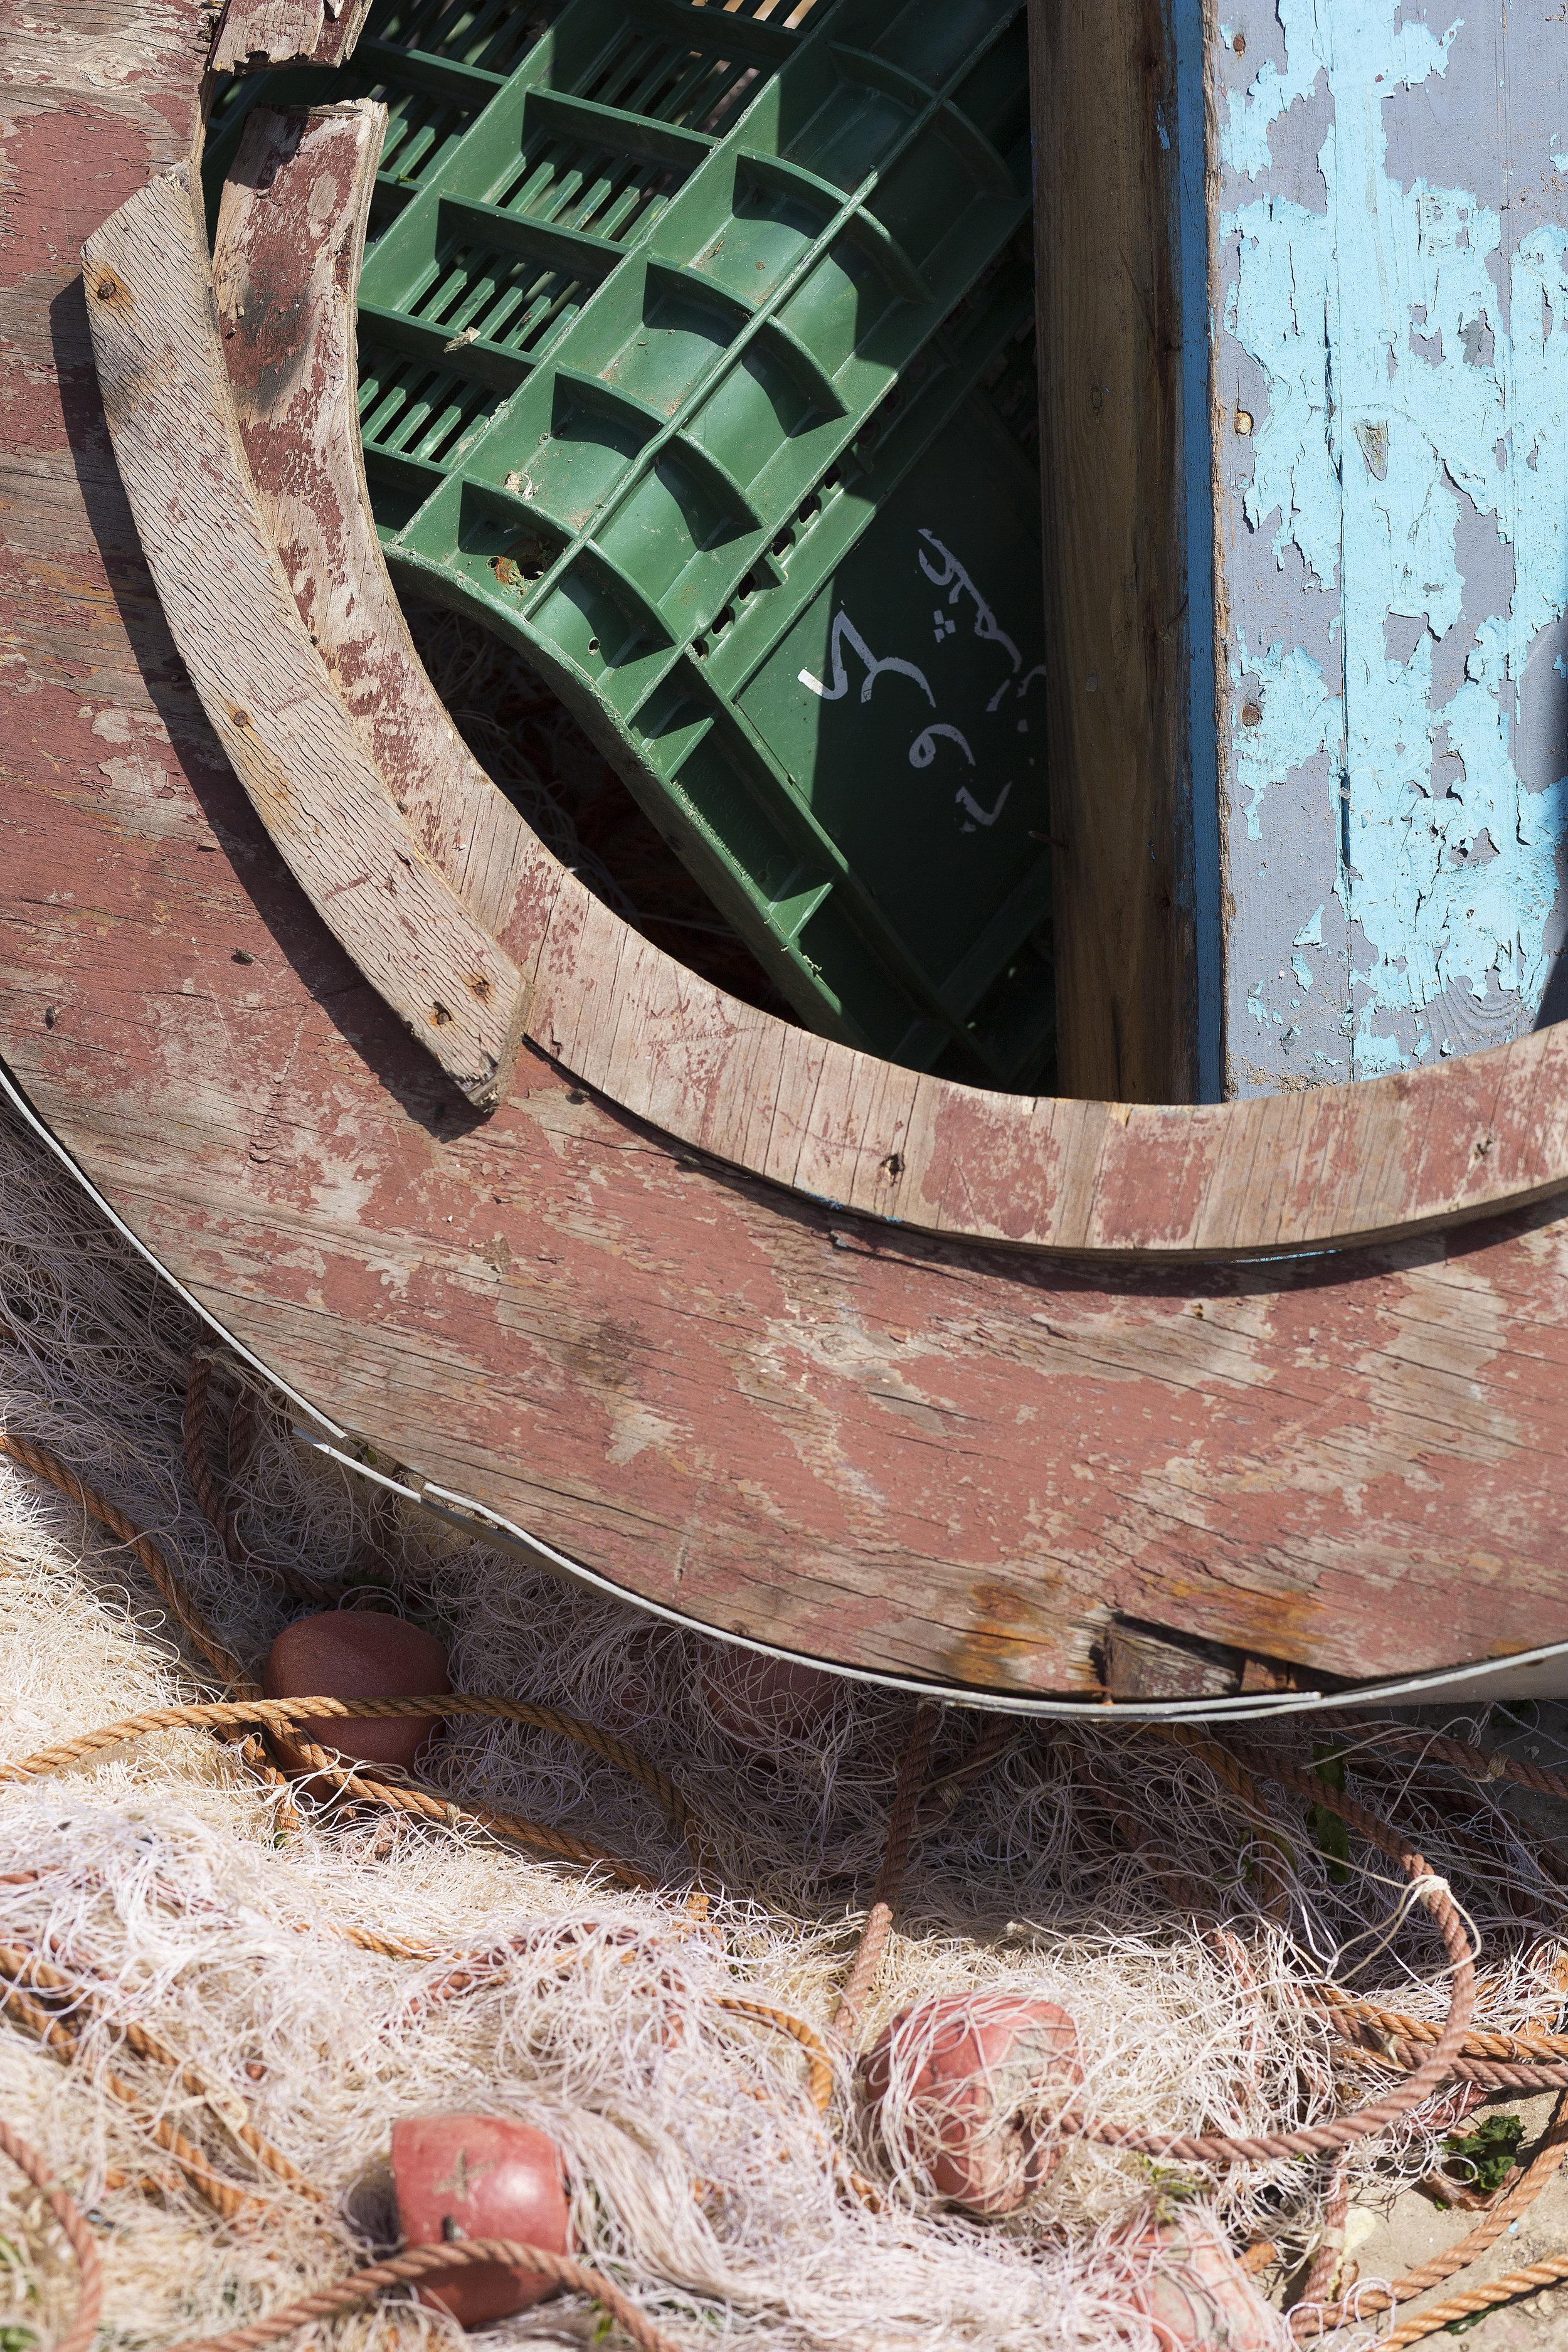 CS_20190403_CanonEOS5DIII_Maroc_Rabat_Marine (61)R.jpg